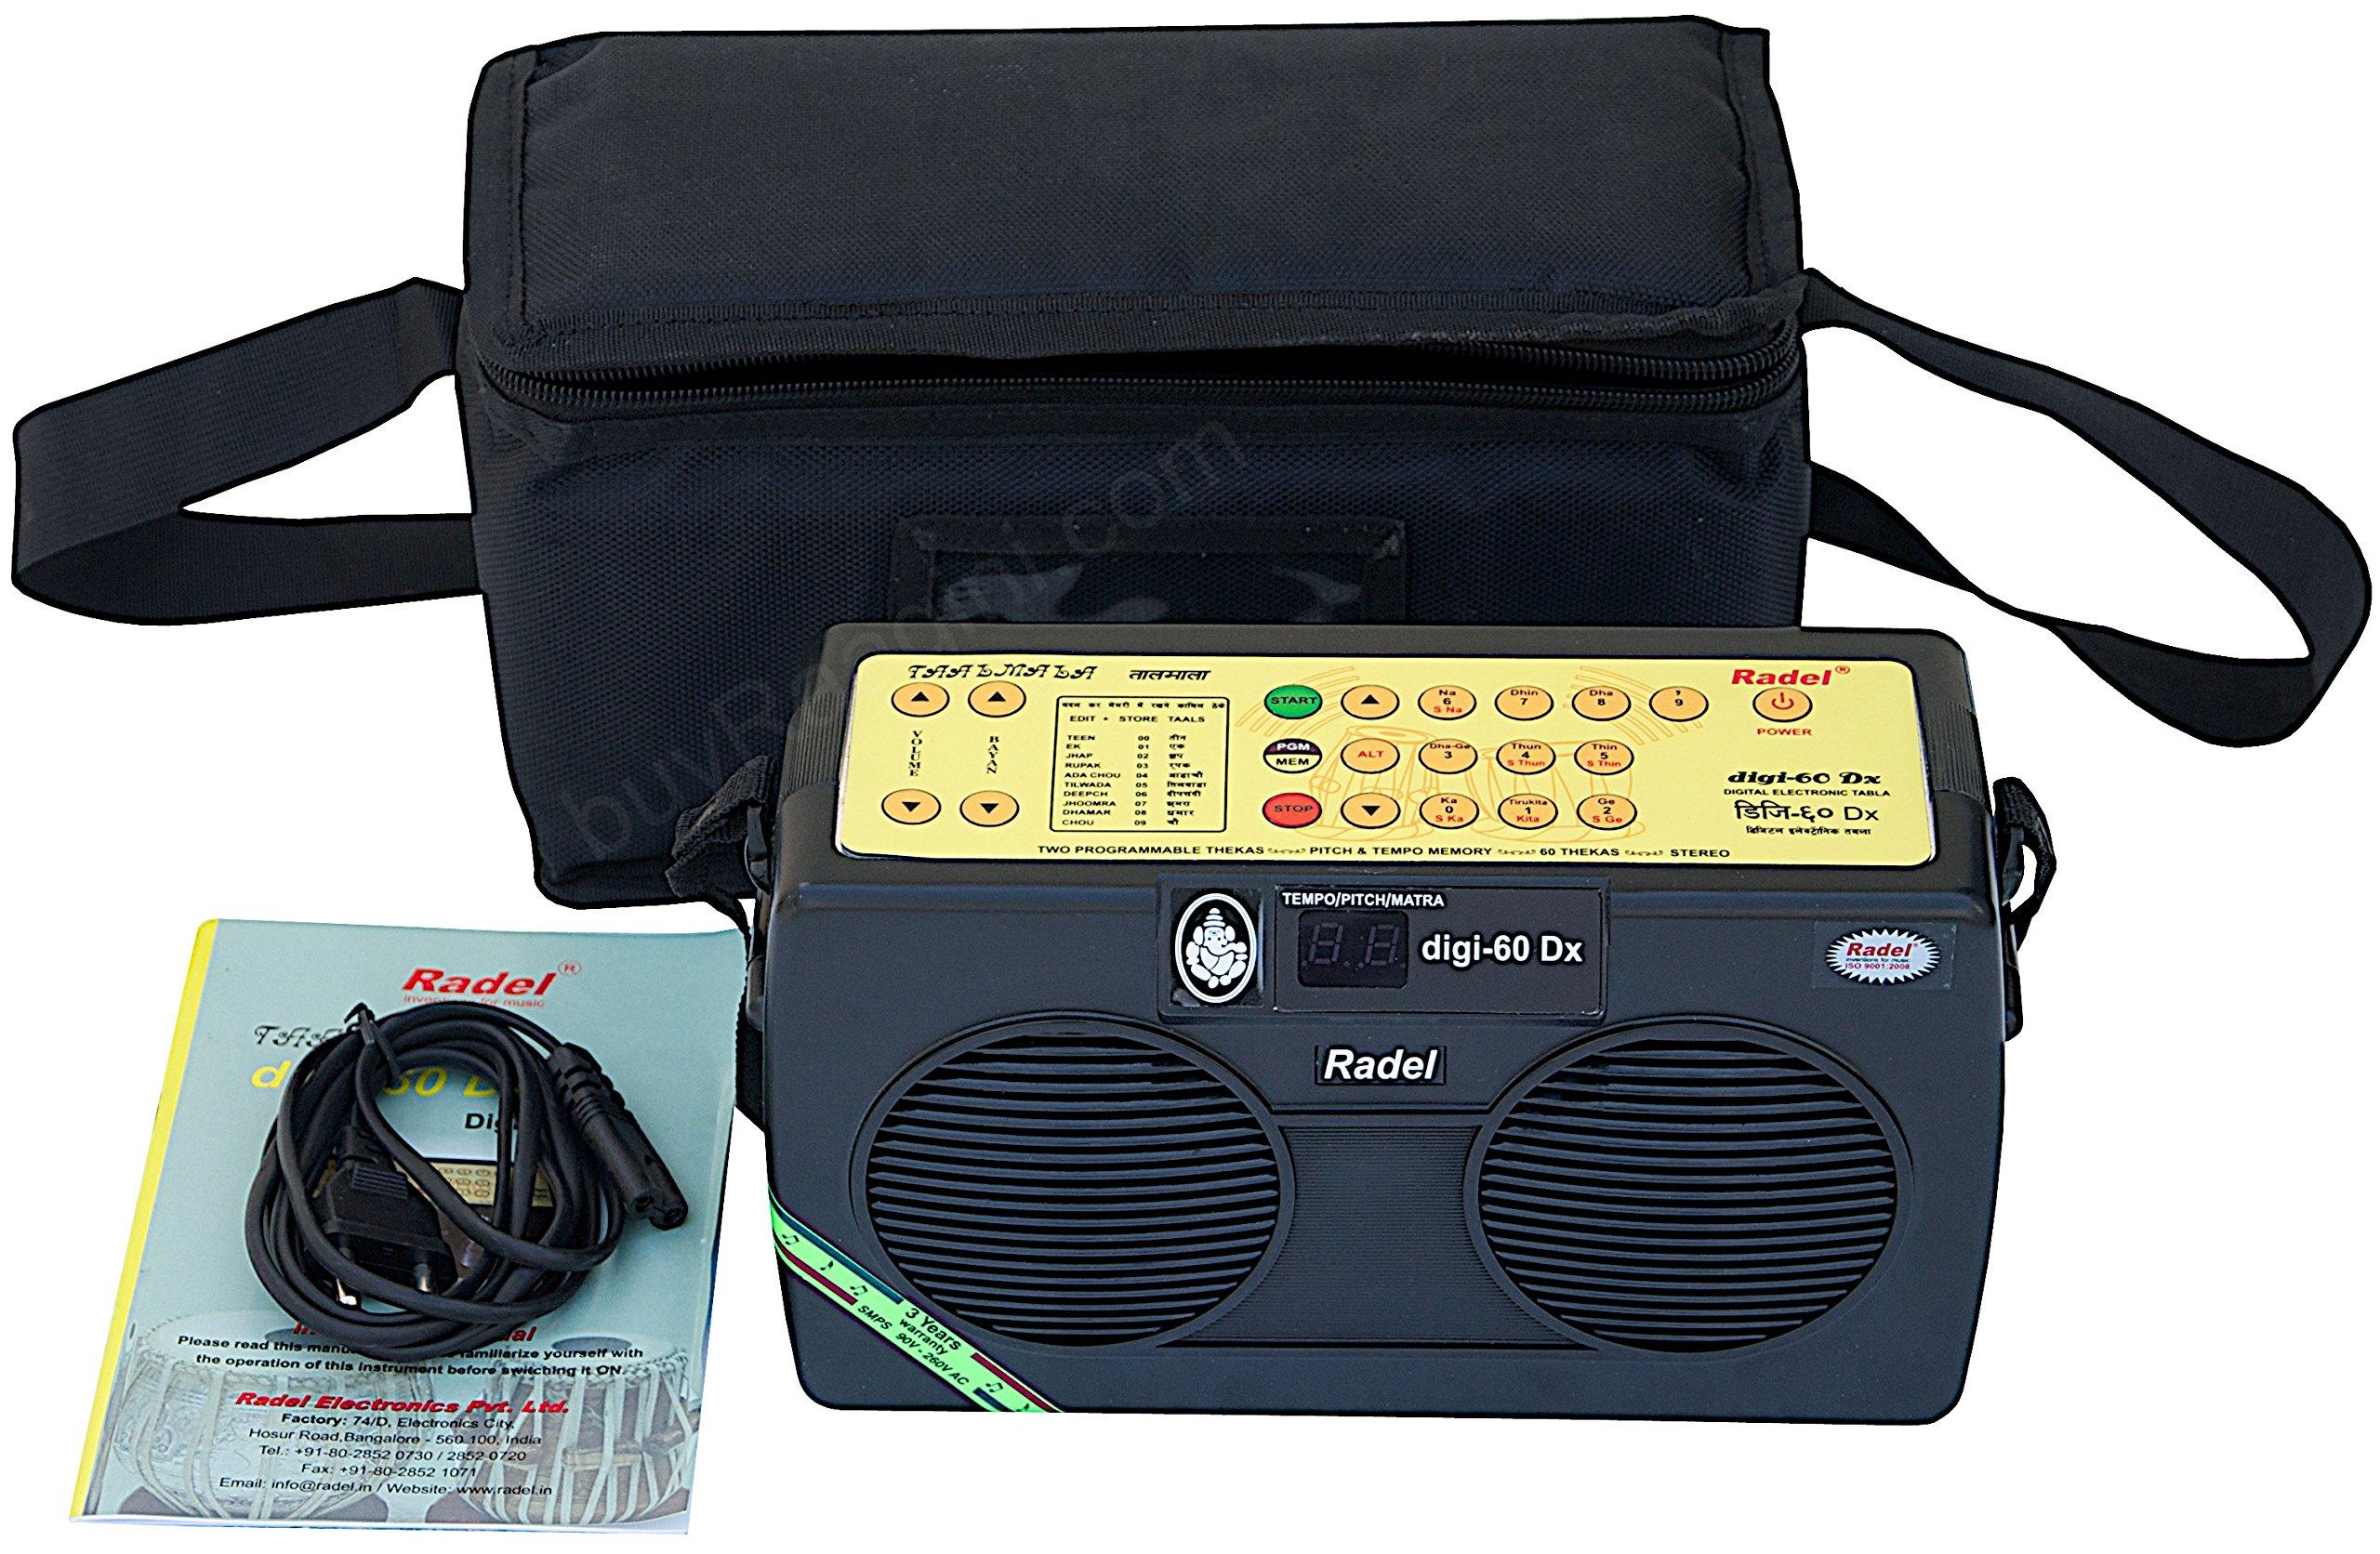 Electronic Tabla - RADEL Digi 60 Electronic Tabla Drum Kit, Digital Tabla Sampler, DJ Tabla Sound Machine, Power Cord, Bag, Instruction Manual (PDI-AAG) by Radel at buyRaagini.com